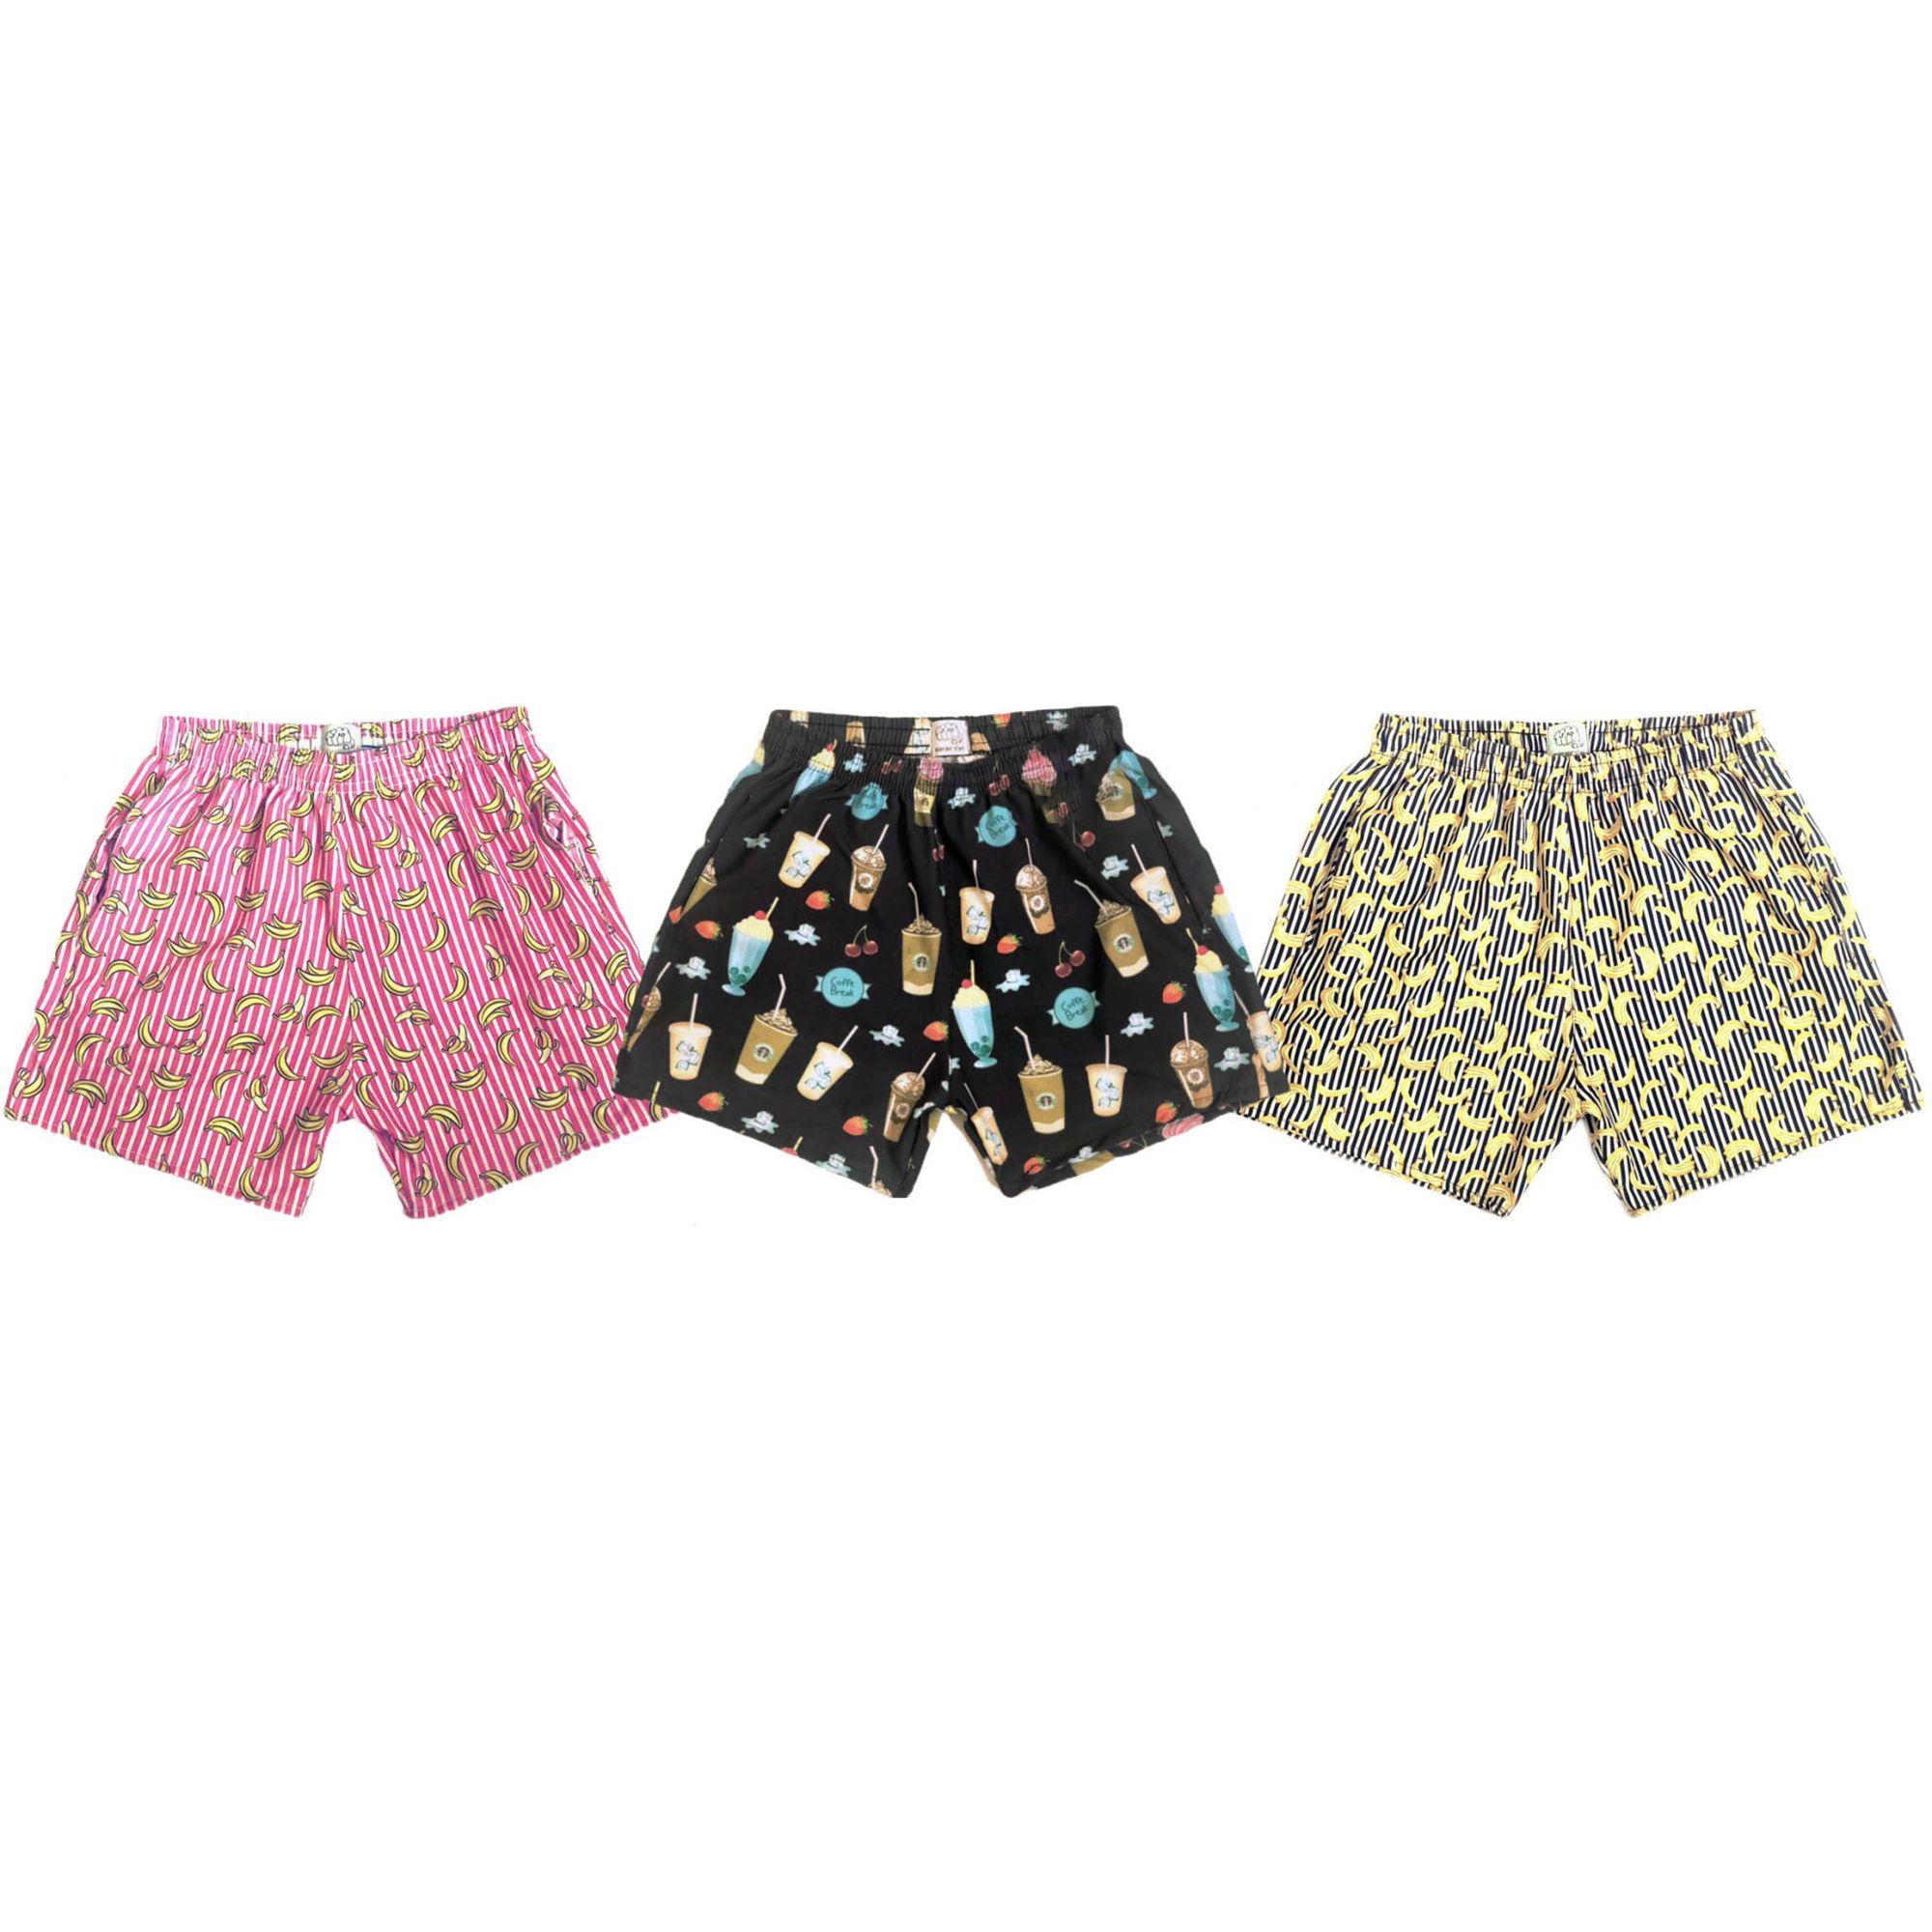 ff45b5f9d Kit 3 Shorts Masculino Praia Tactel C  Elastano Estampado Marca J10 -  Frent´s